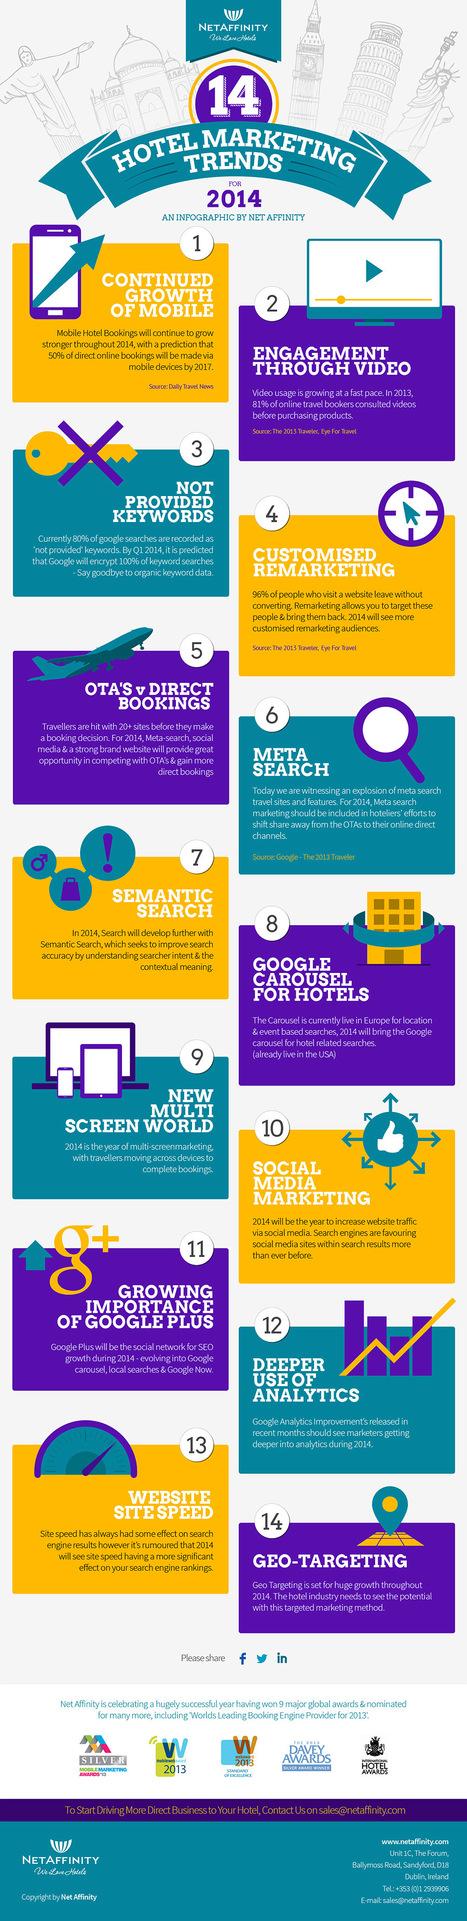 Hotel marketing trends – meta, Google Carousel, site speed, and more [INFOGRAPHIC] | Médias sociaux et tourisme | Scoop.it